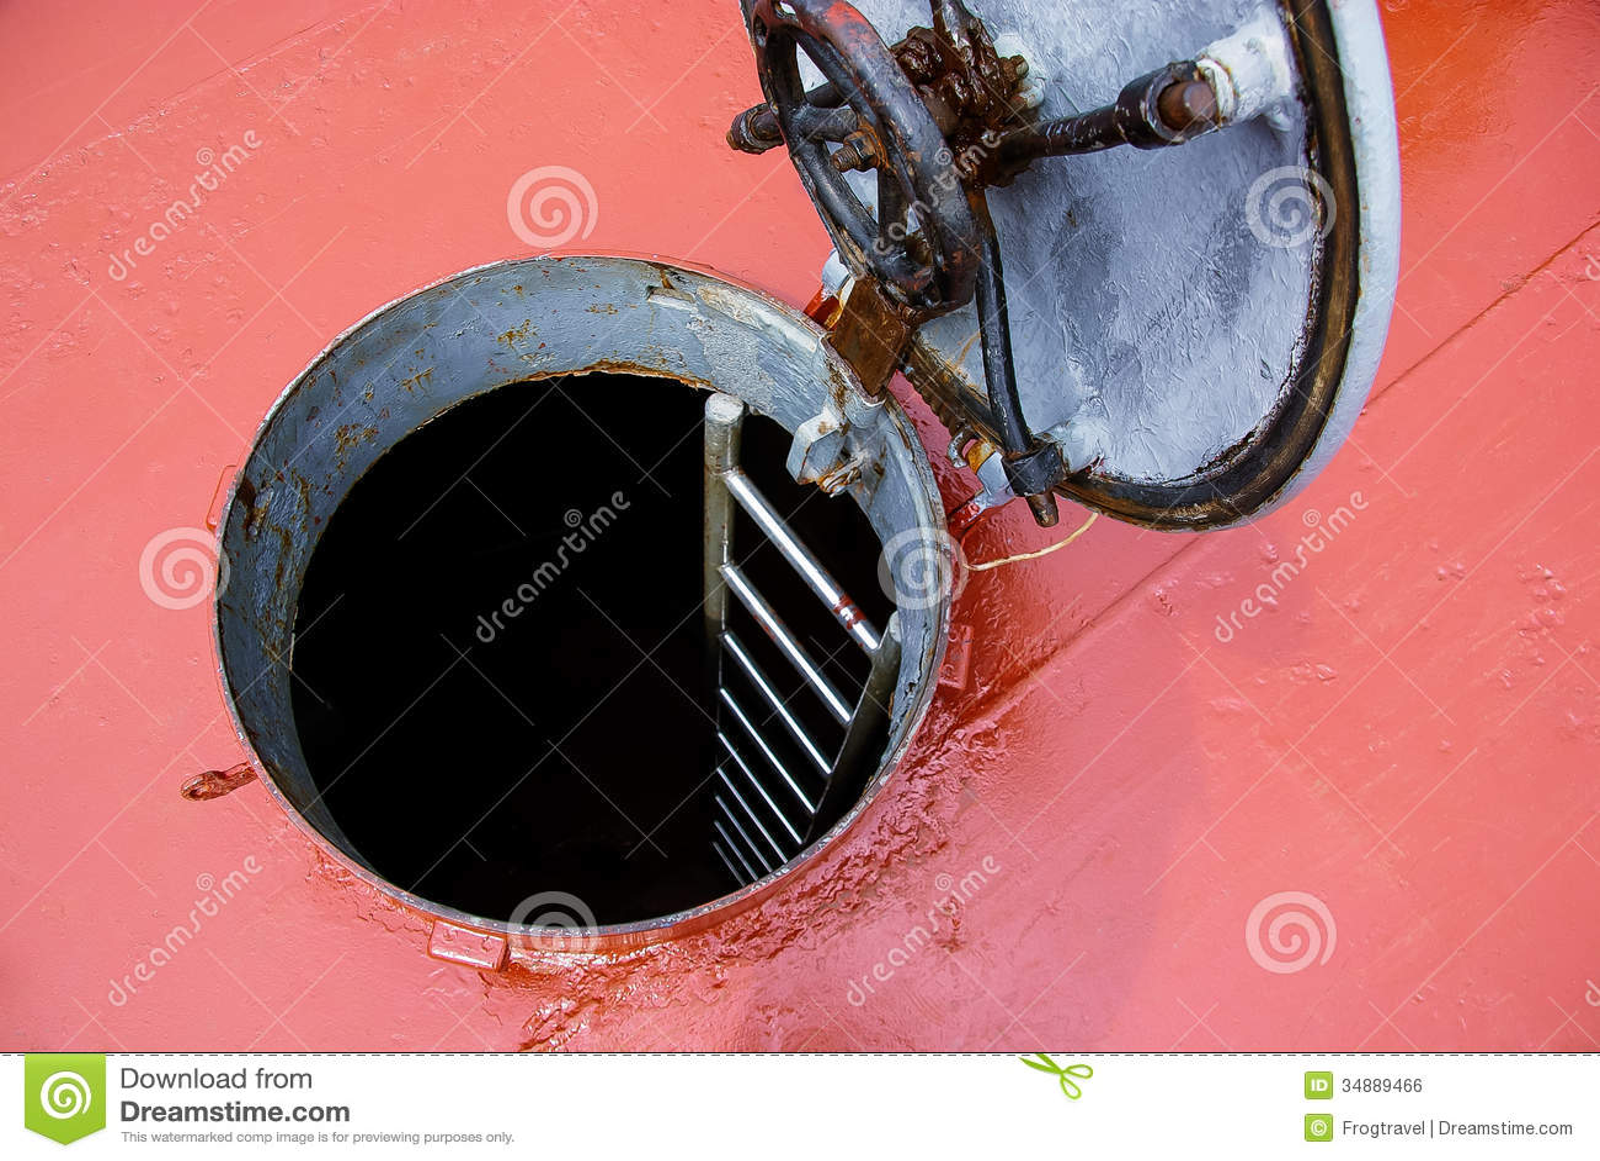 Hatch Door On Deck Royalty Free Stock Image Image 34889466